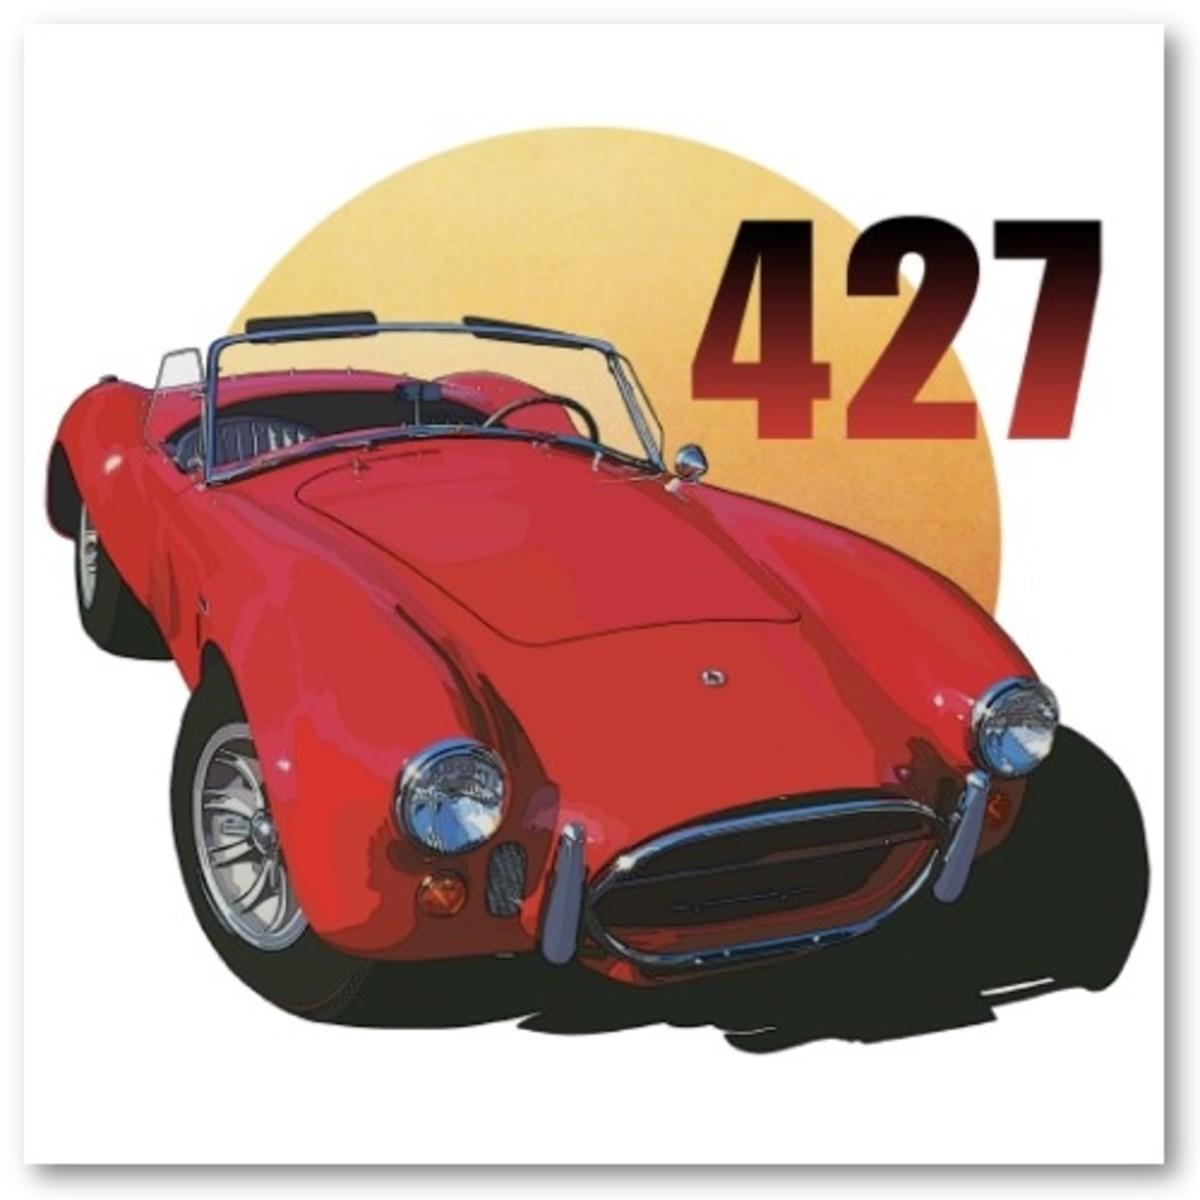 427 Cobra Illustration by Richard Browne